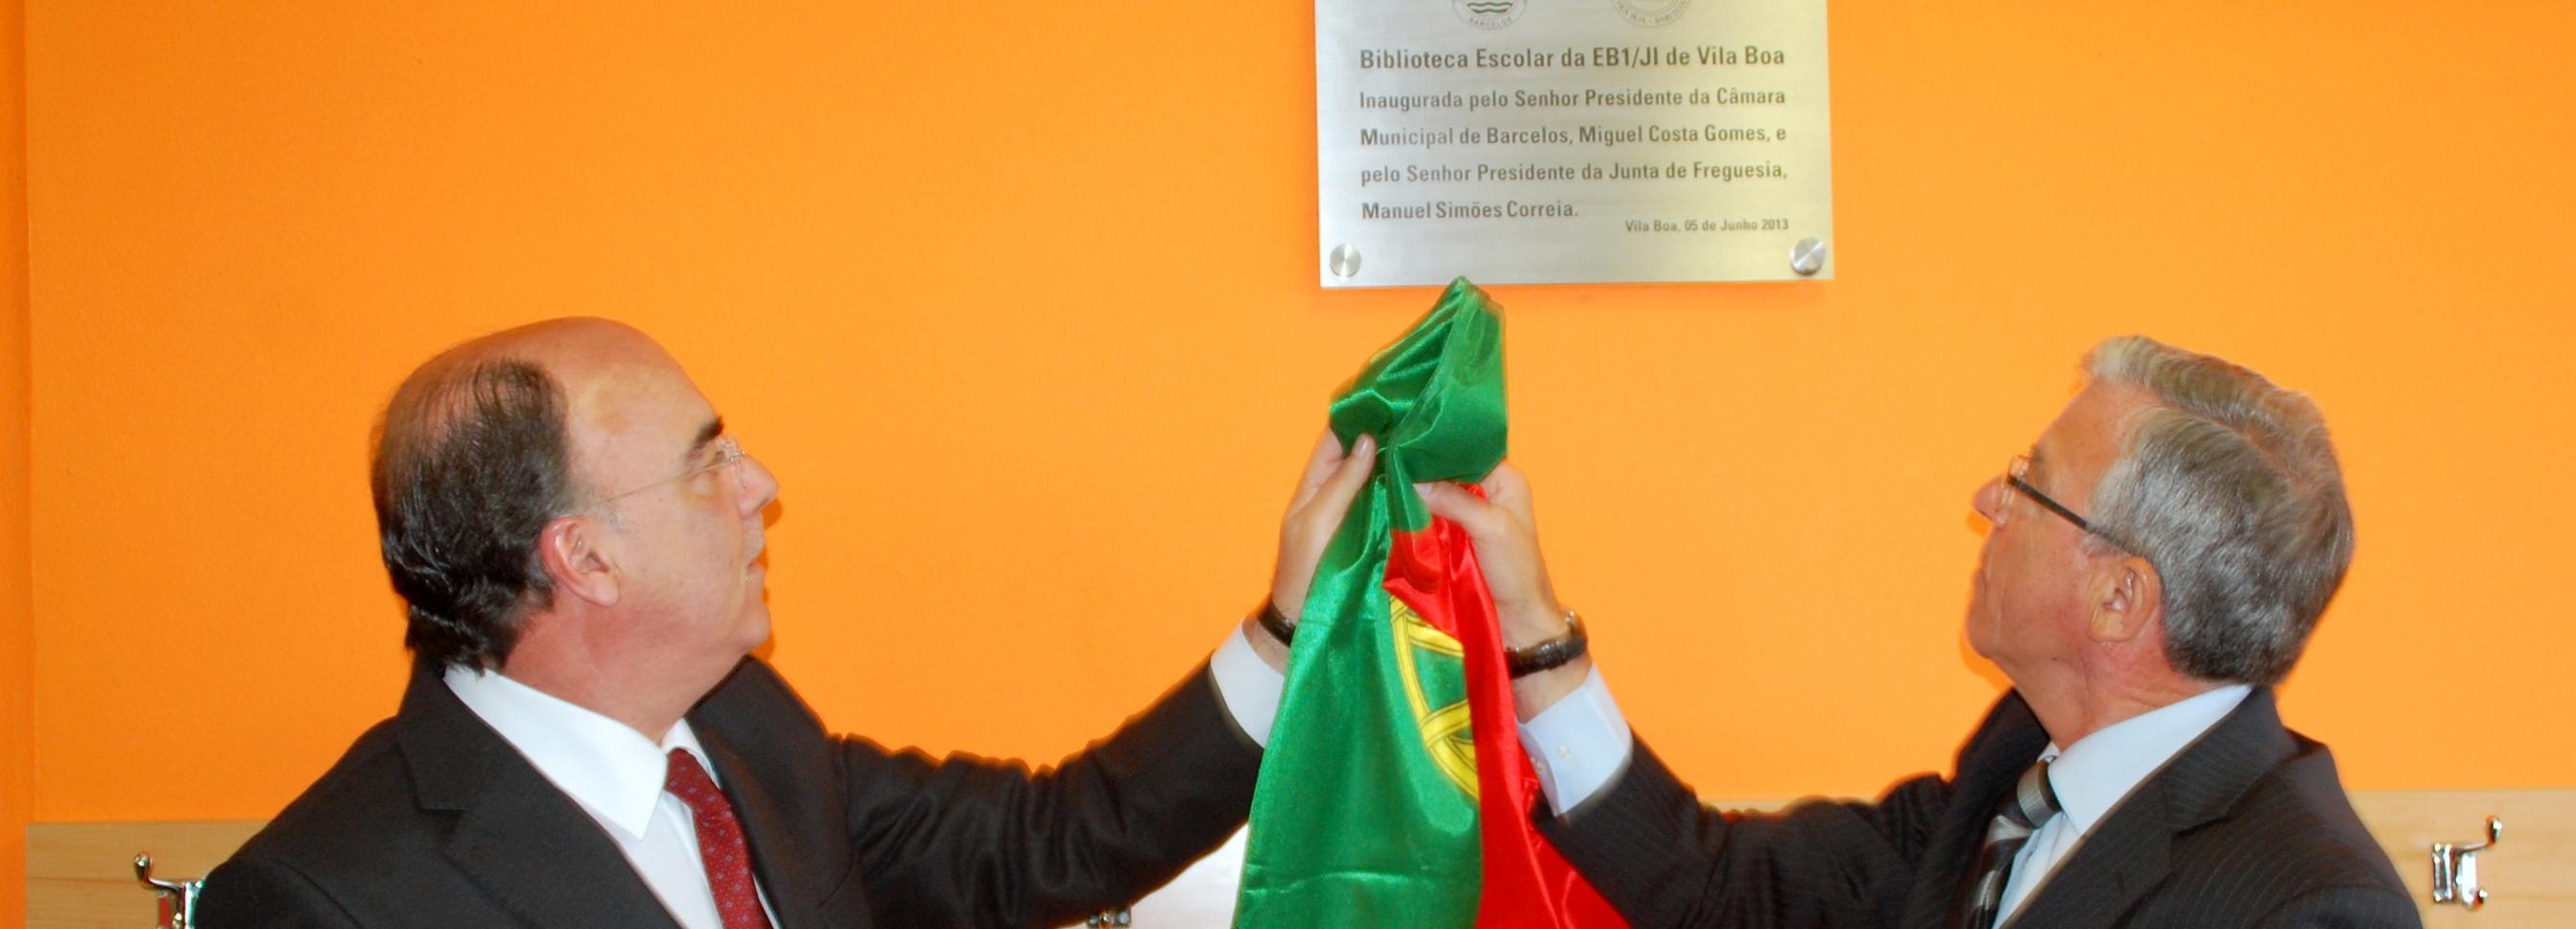 Presidente da Câmara inaugurou biblioteca escolar da EB1/JI de Vila Boa